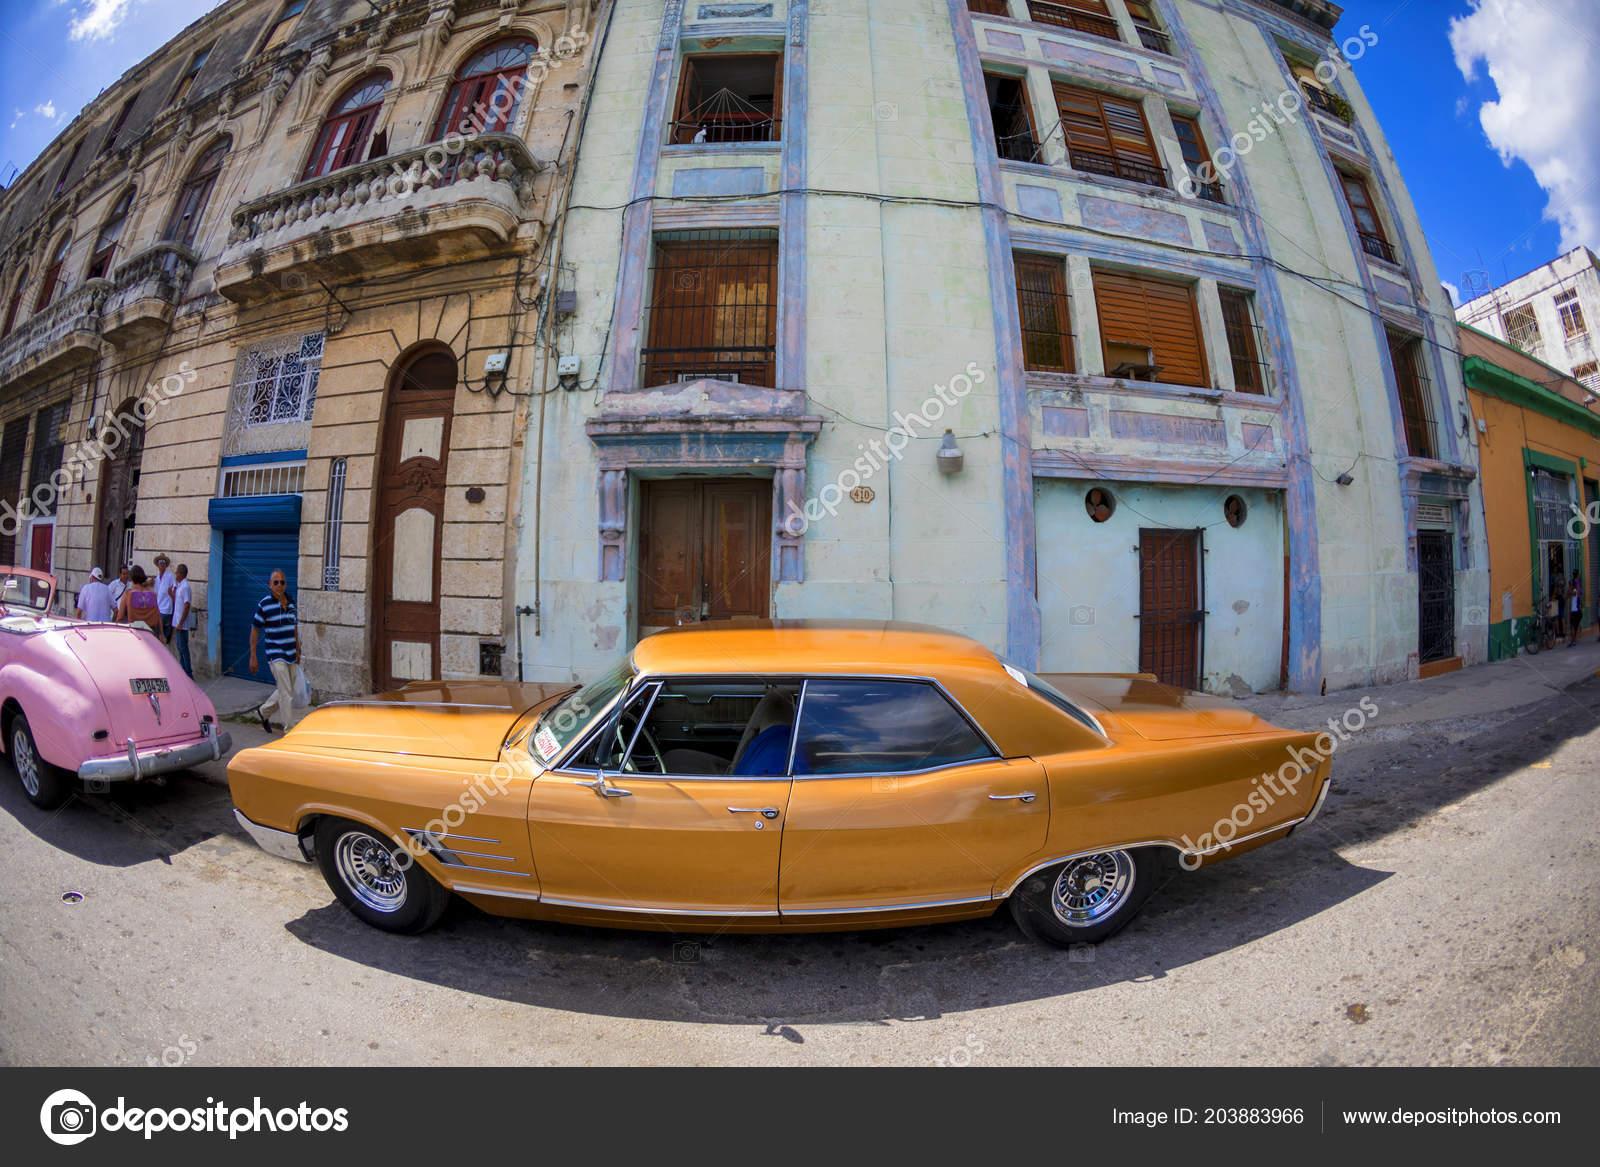 Havana Cuba 2018 Vintage Classic American Cars Restored Condition